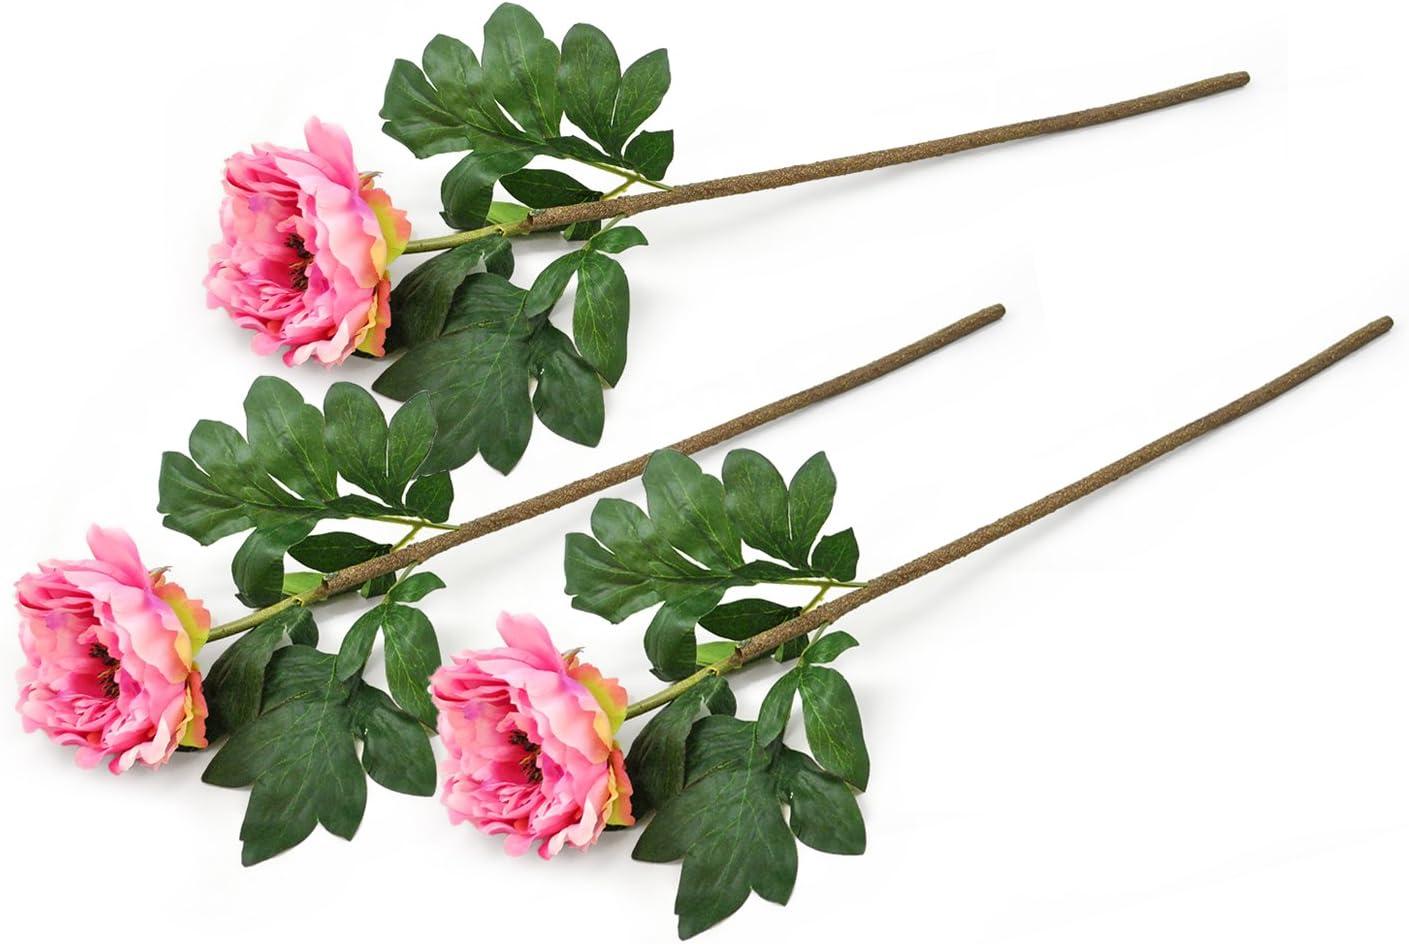 DII 3 Piece Artifical Peony Silk Flowers For Bridal Bouquet, Home Decoration, DIY, Garden, Office Decor, Centerpiece Décor - Light Pink